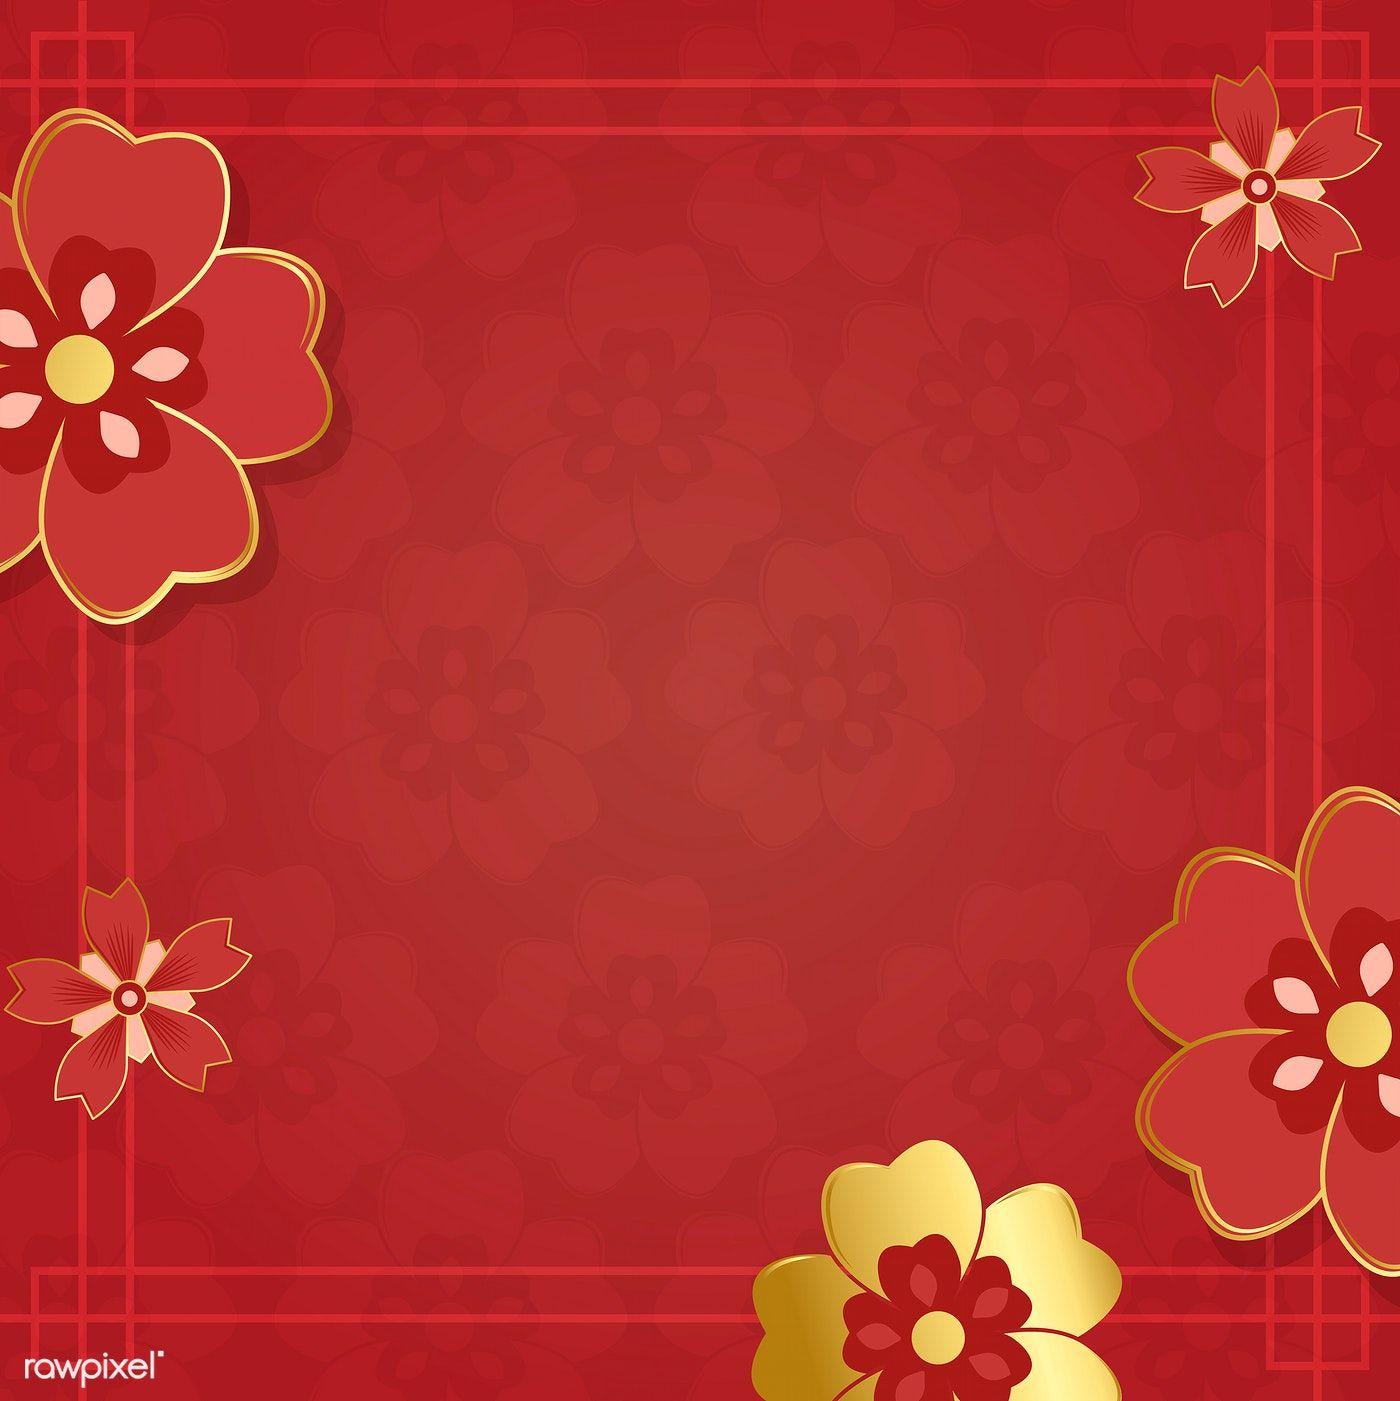 Chinese New Year 2019 Greeting Background Free Image By Rawpixel Com Kappy Kappy Chinese New Year Background Vector Free Chinese Background